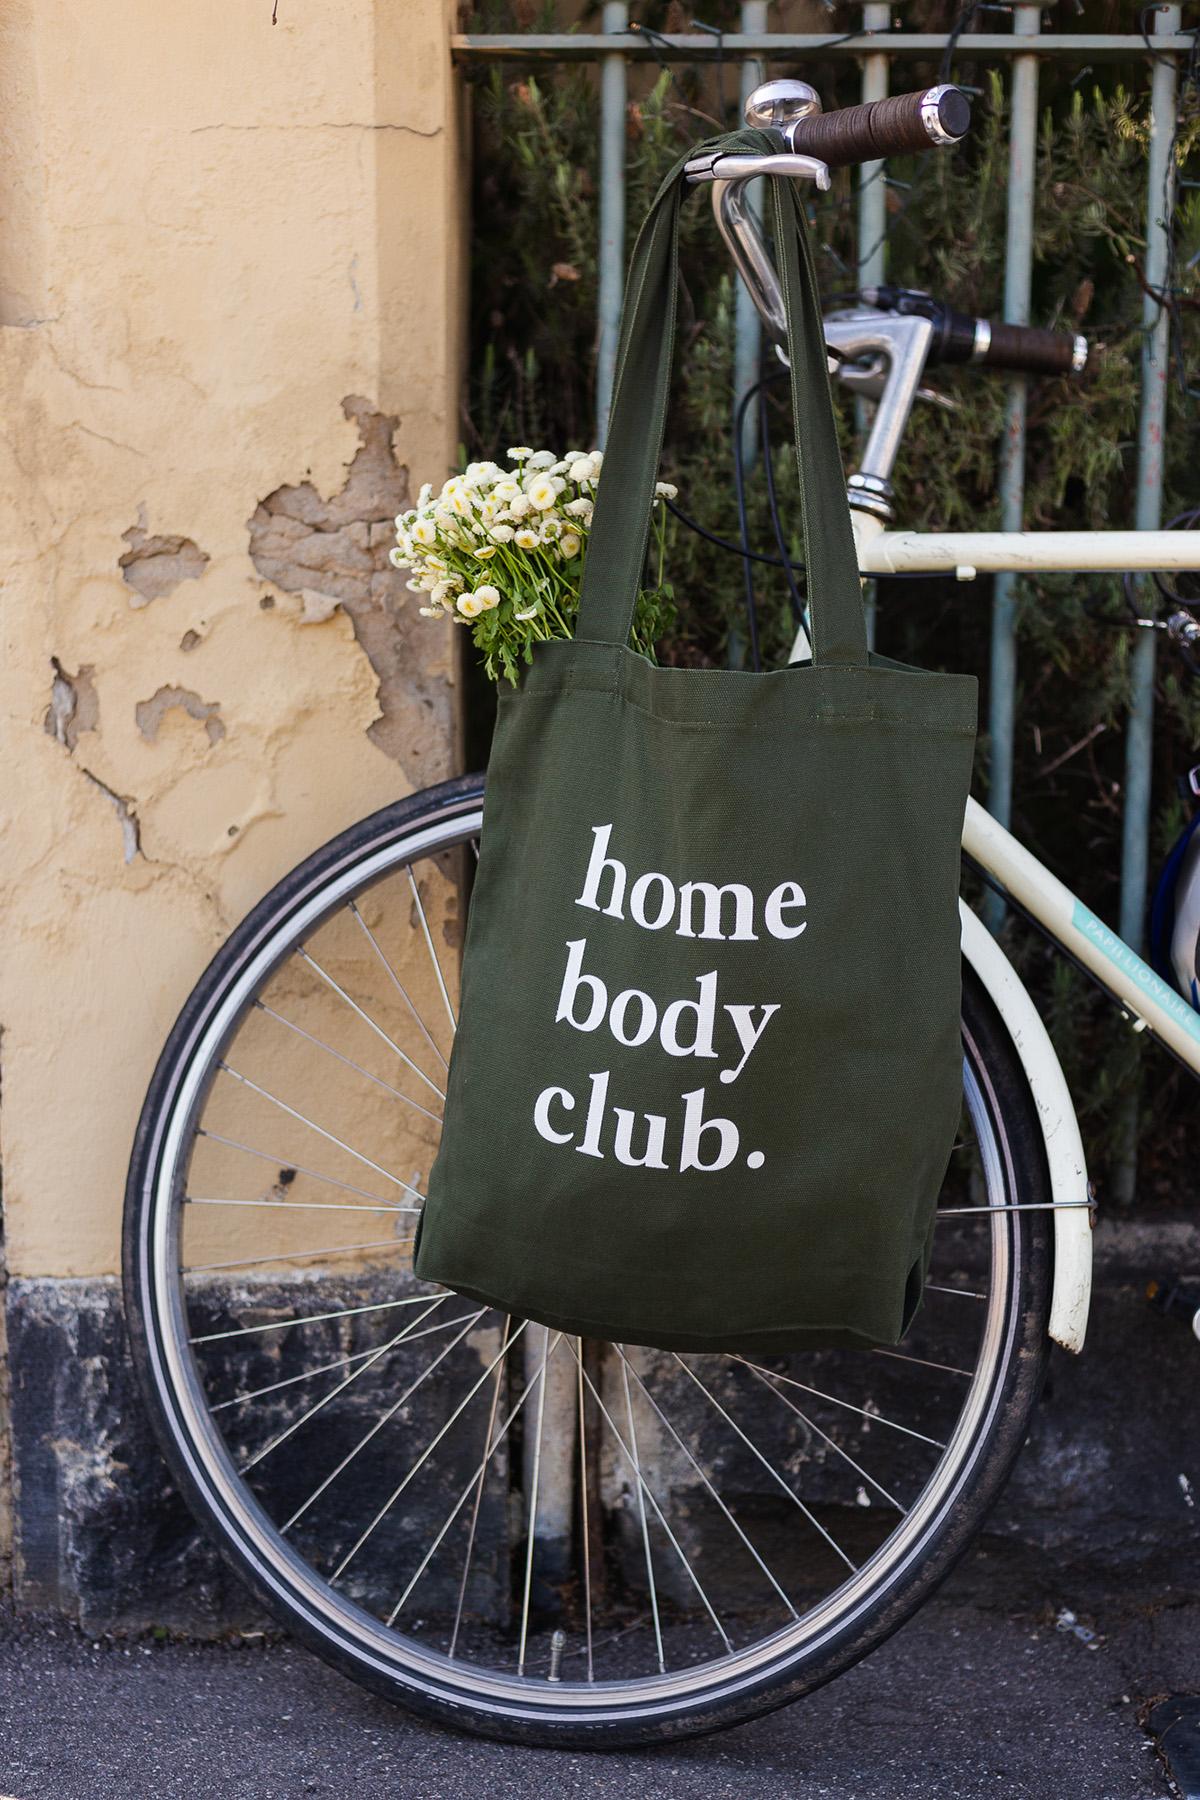 homebodyclub-lcarvitto16_resize.jpg